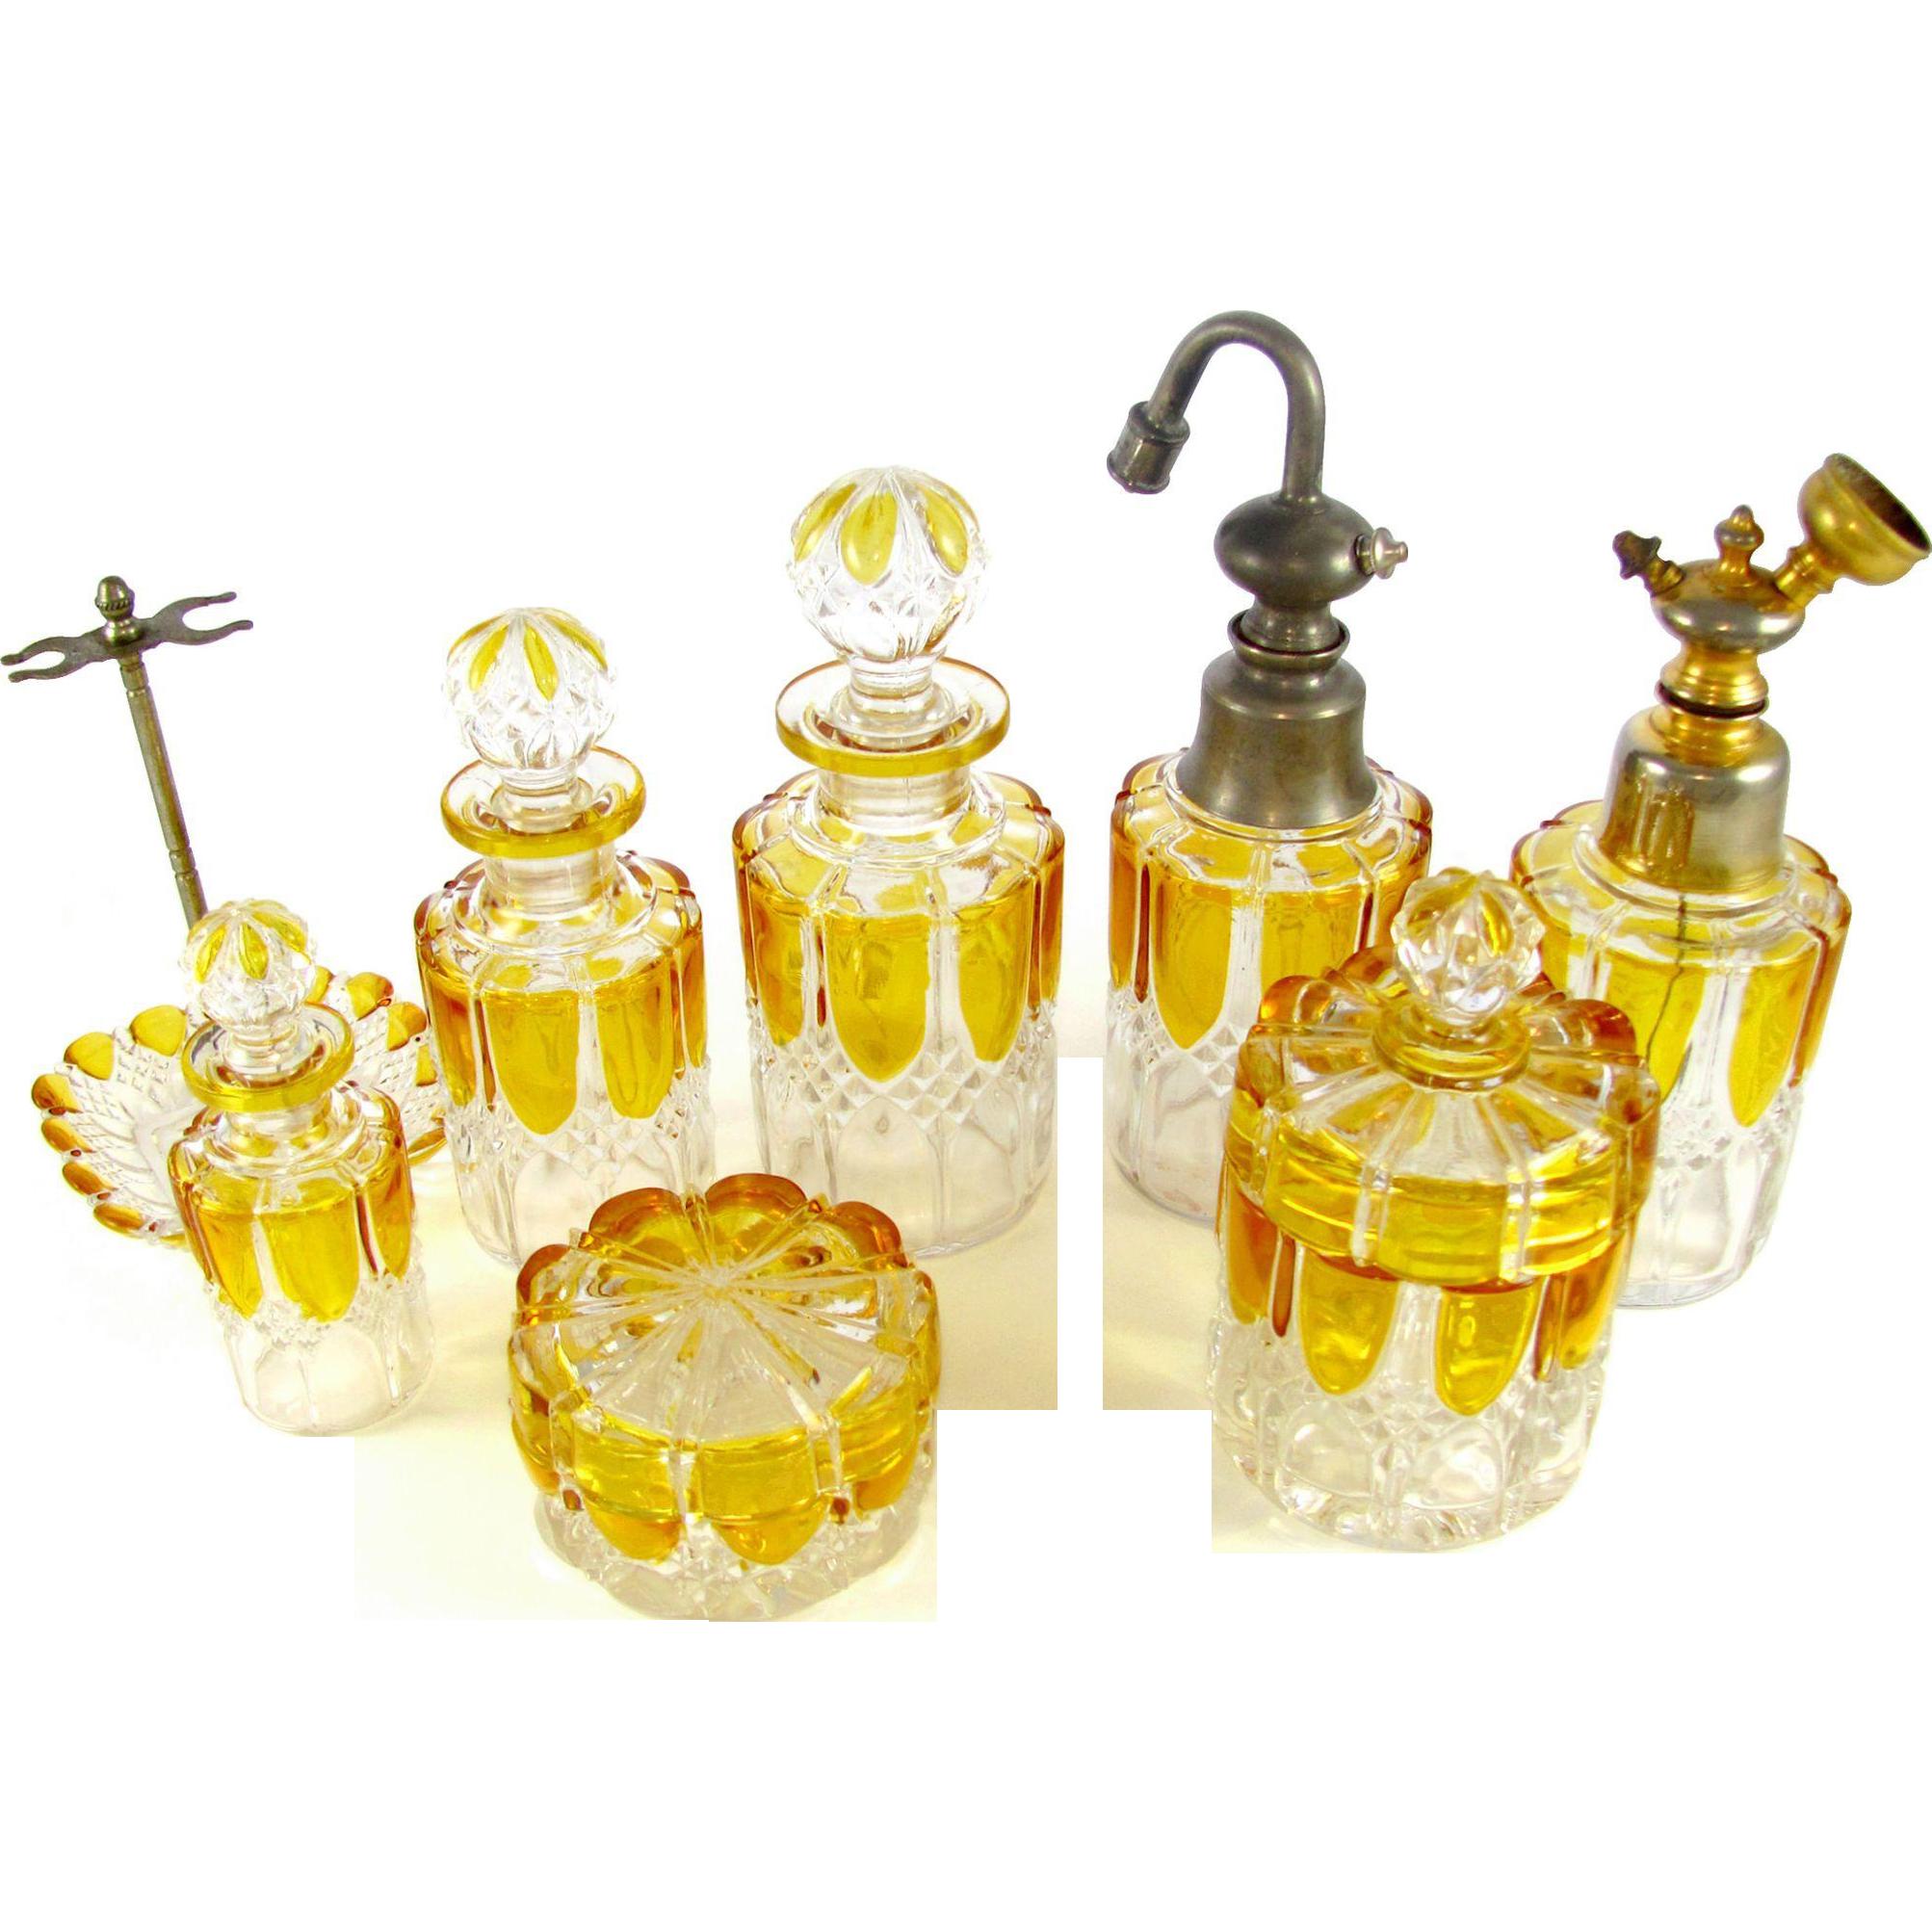 8pc Val Saint Lambert Crystal Valembert Pattern Dresser / Vanity Perfume Bottle Set